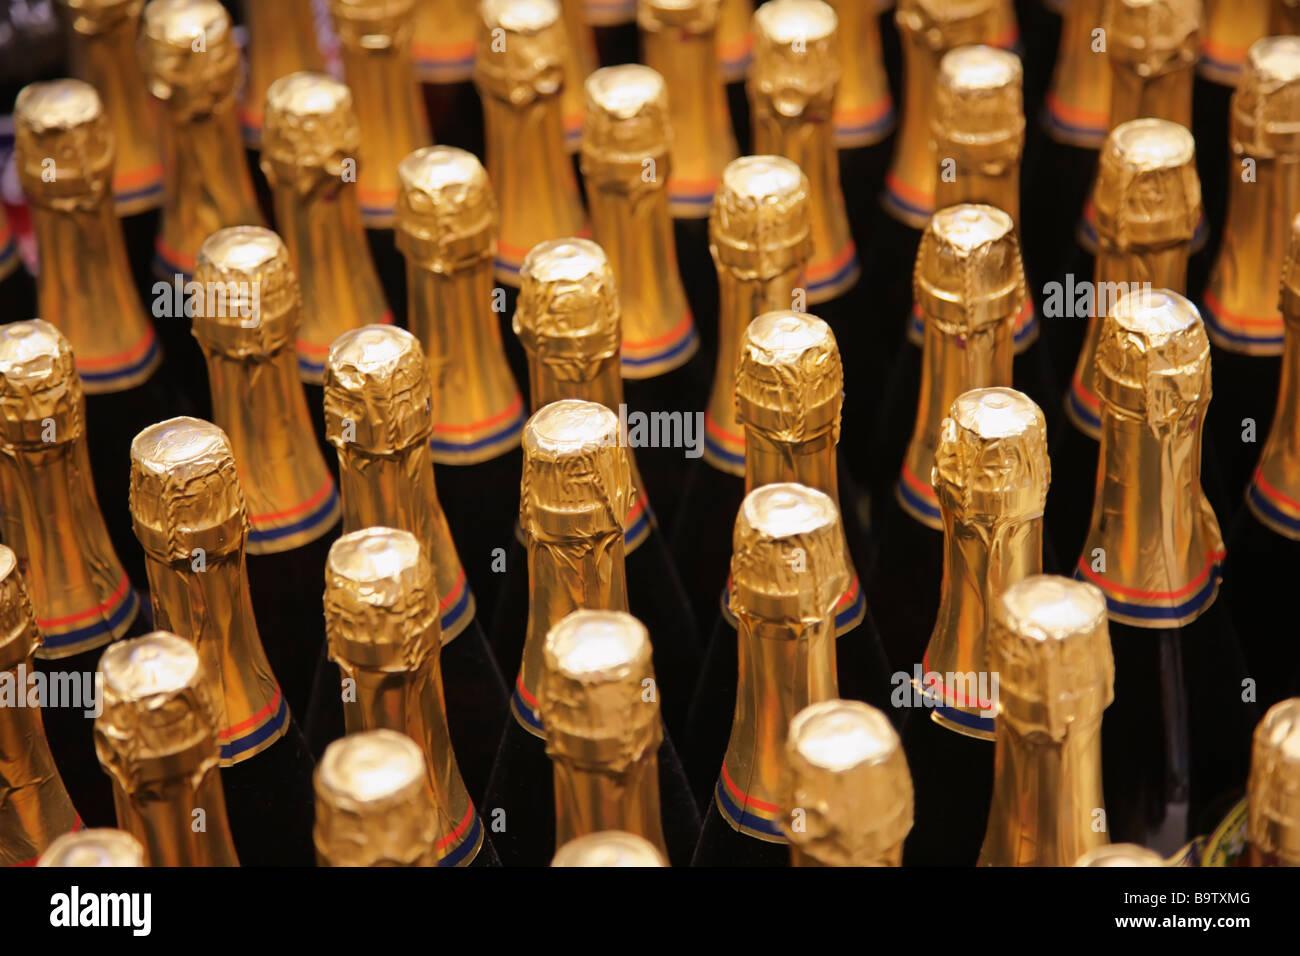 Фото бутылке шампанцкава 11 фотография